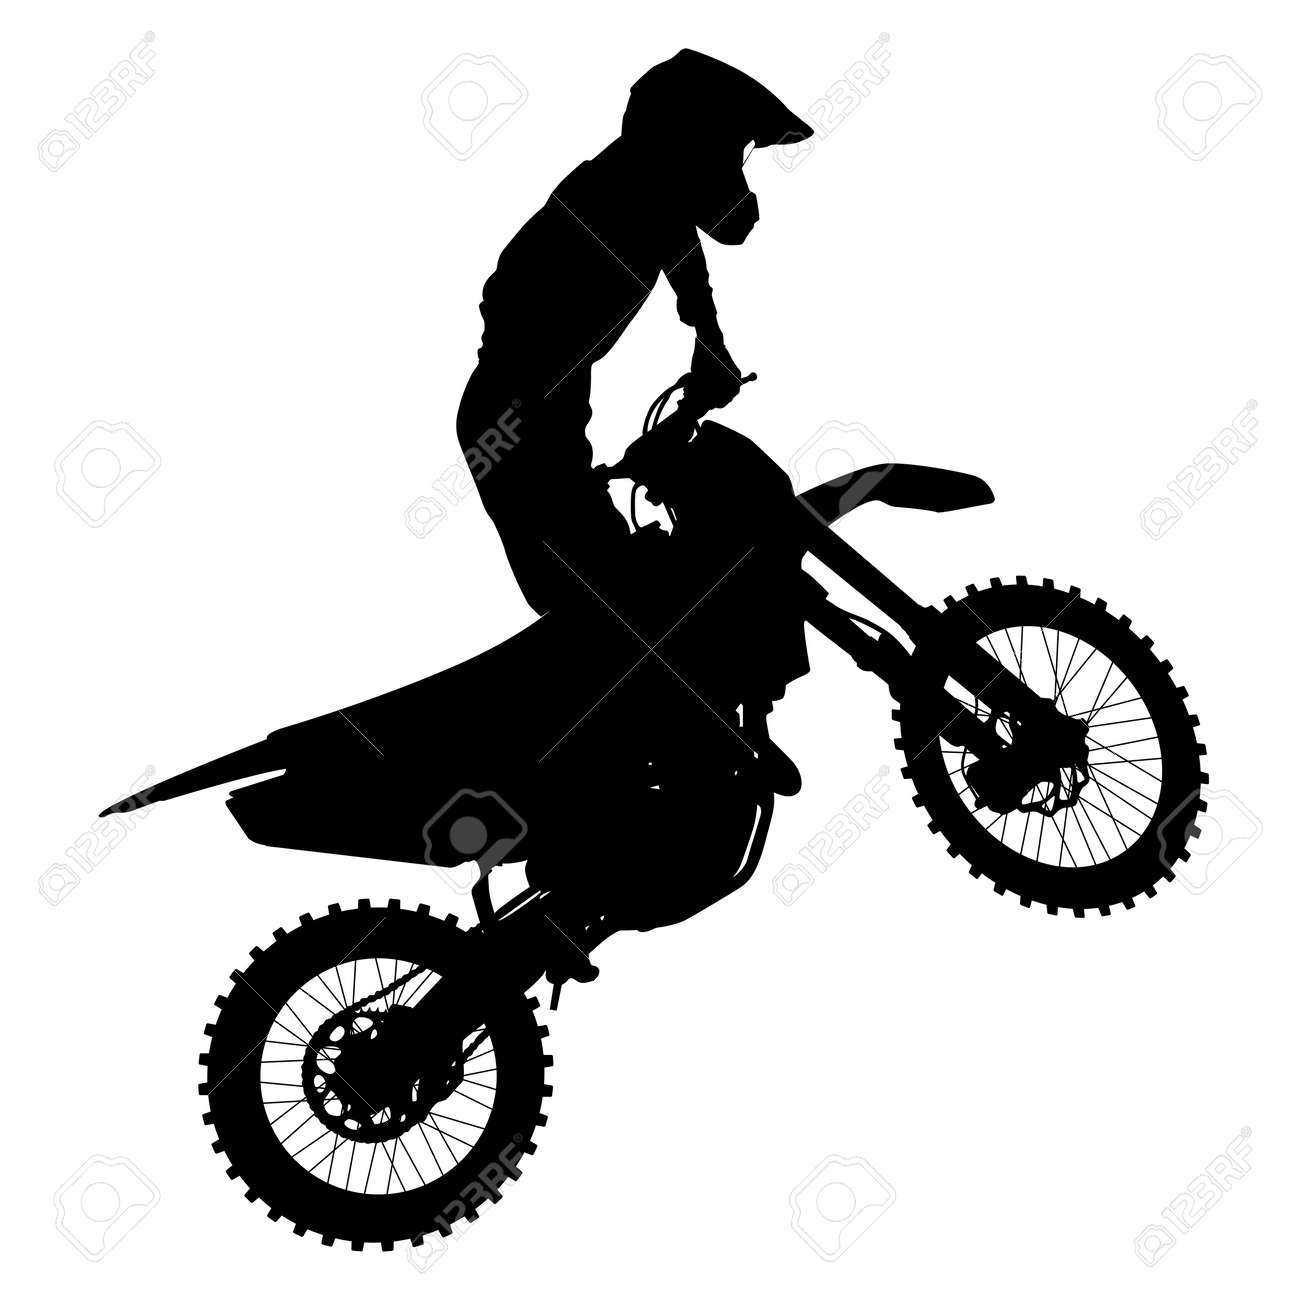 9 284 motocross stock vector illustration and royalty free motocross rh 123rf com motocross clipart free motocross helmet clipart